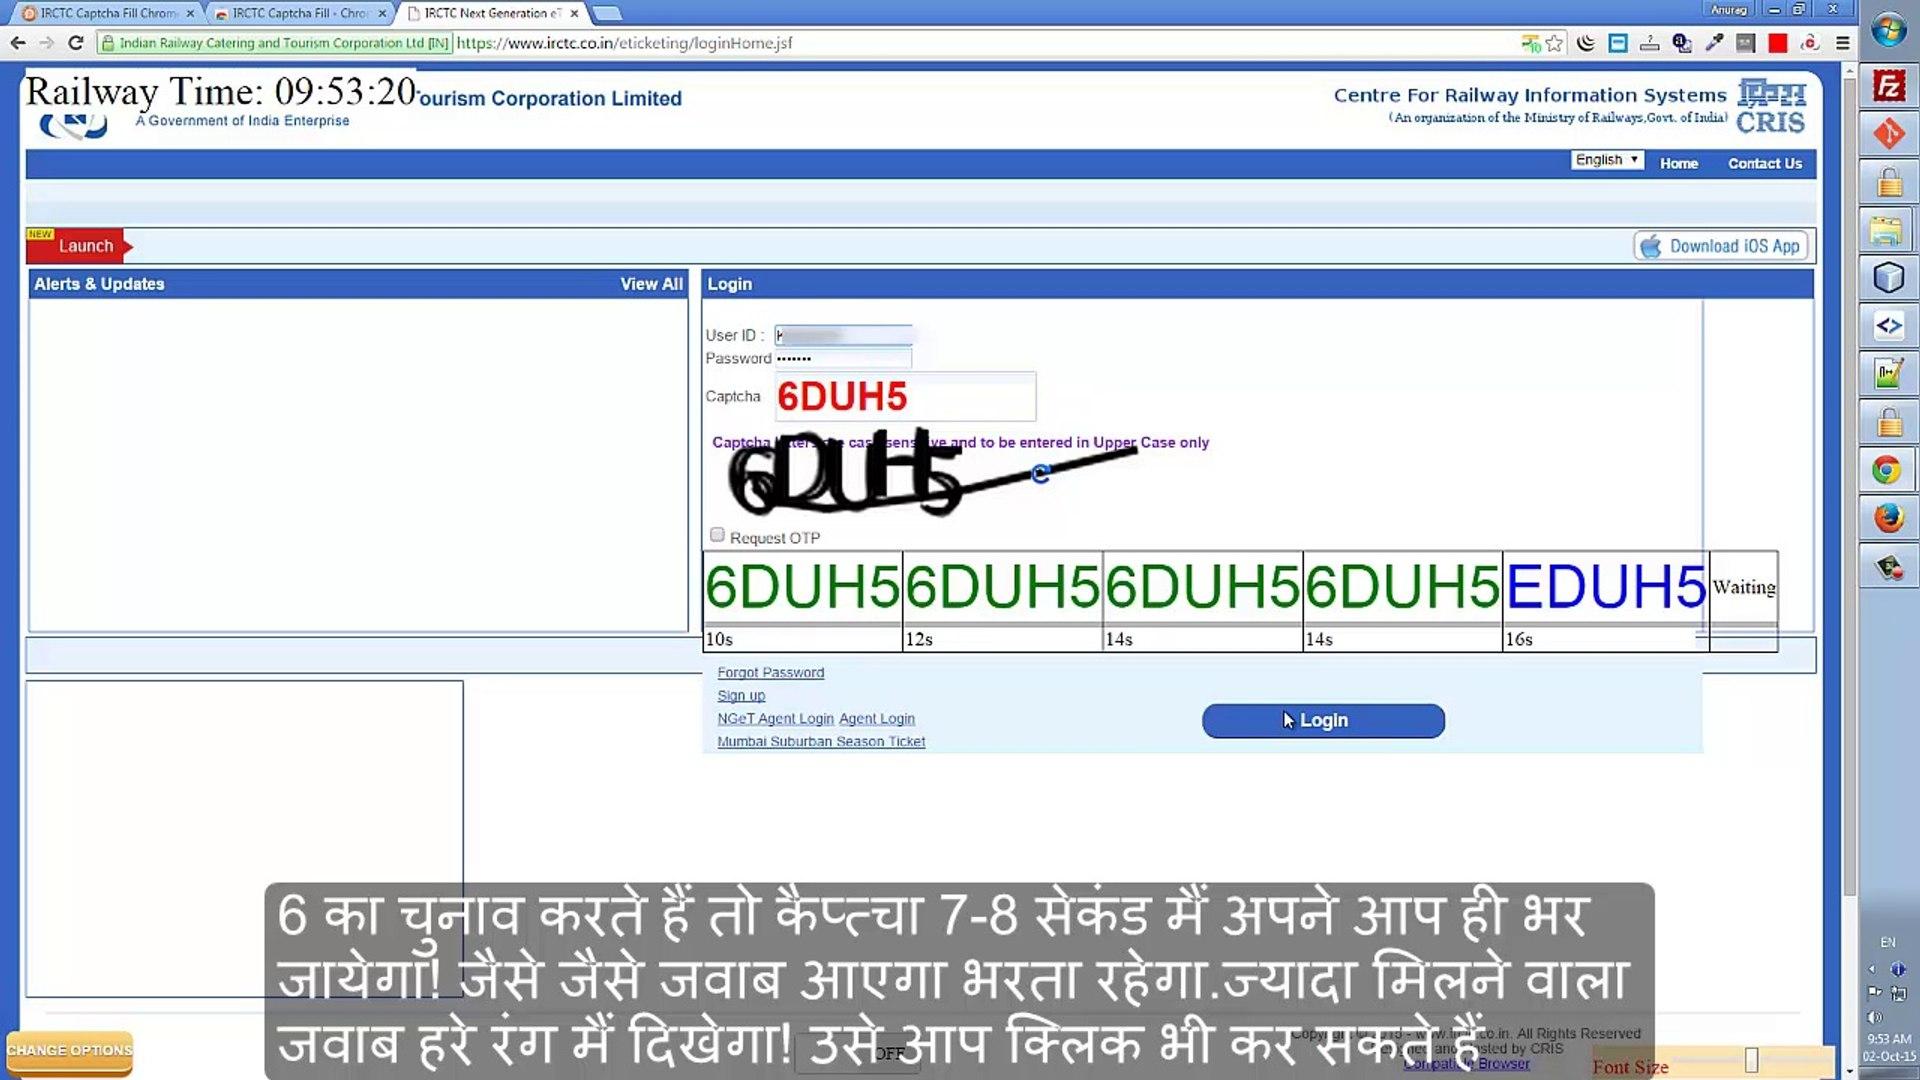 d tatkal free software for aam aadmi